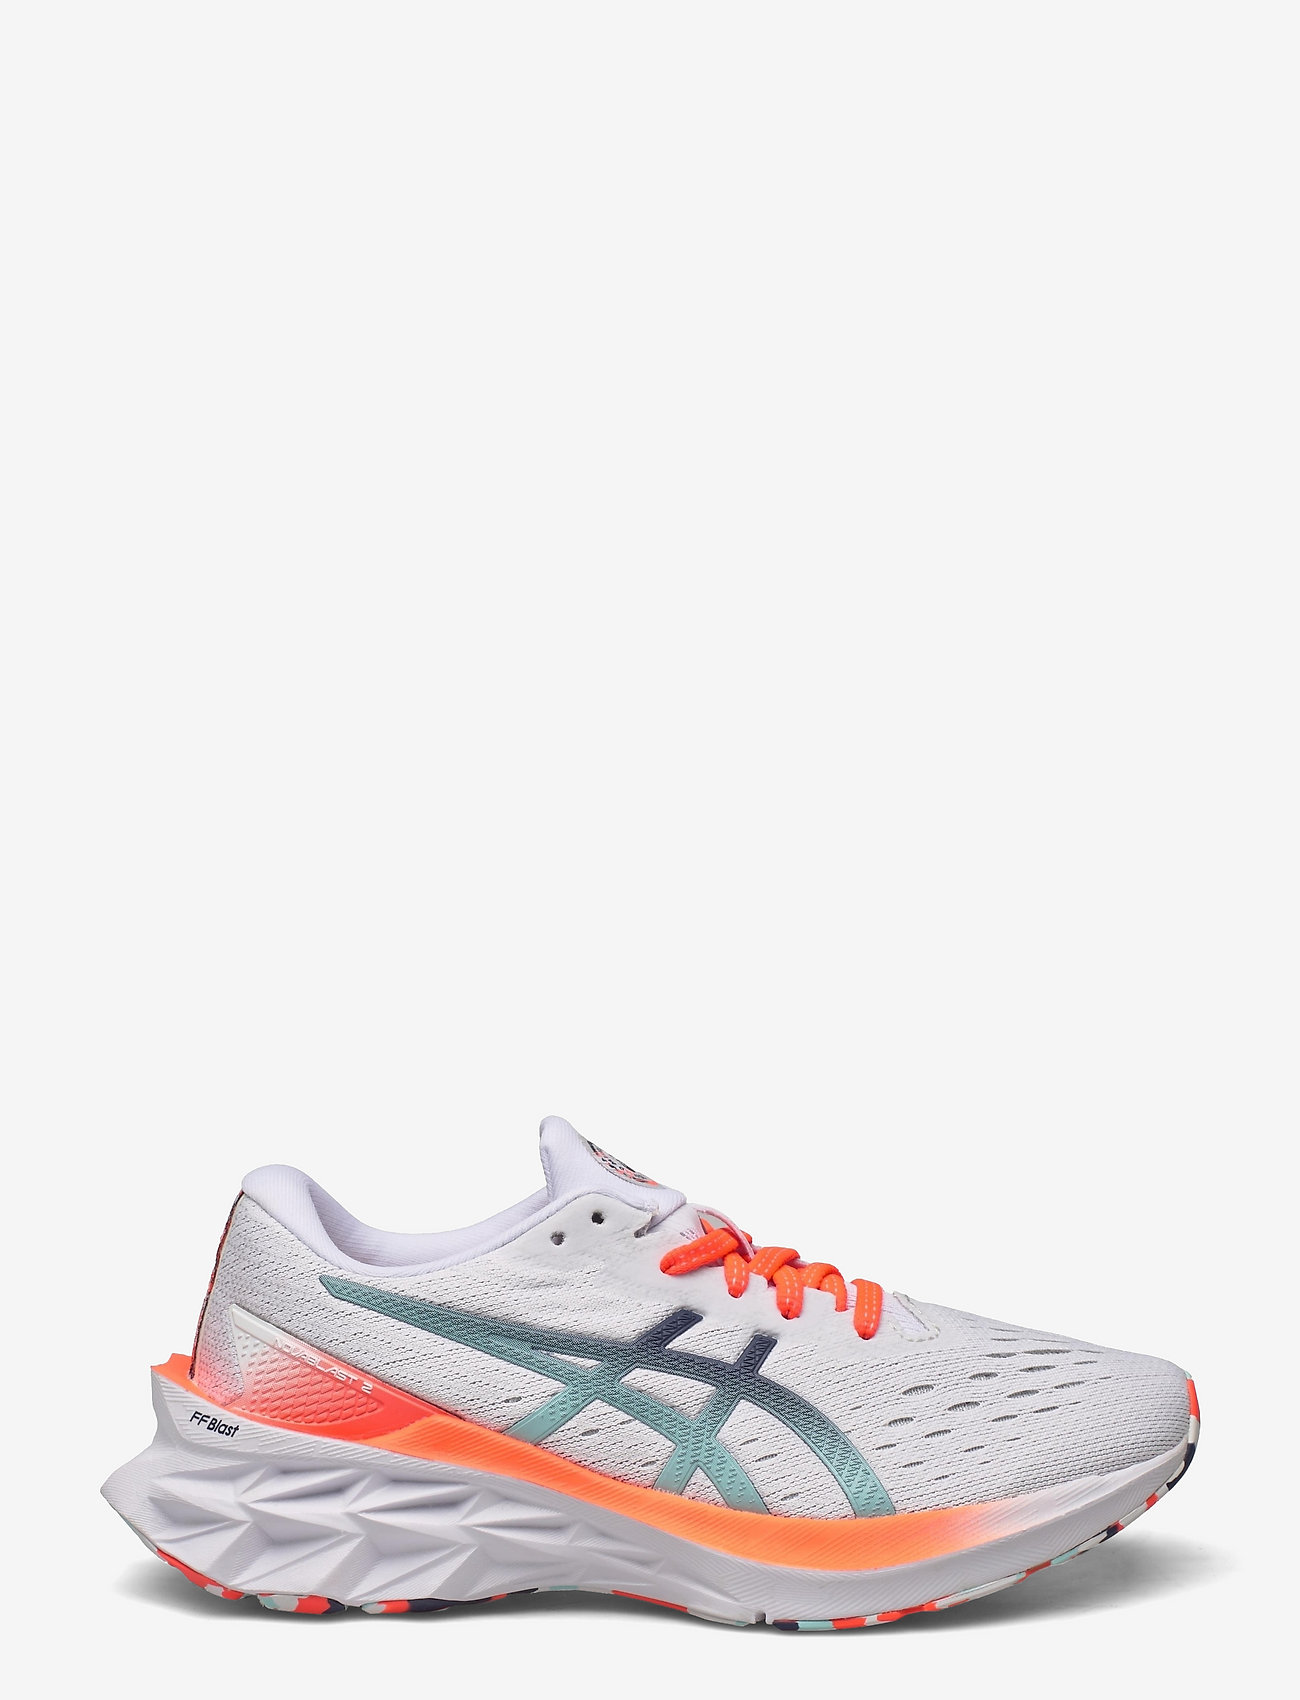 Asics - NOVABLAST 2 - running shoes - white/white - 1